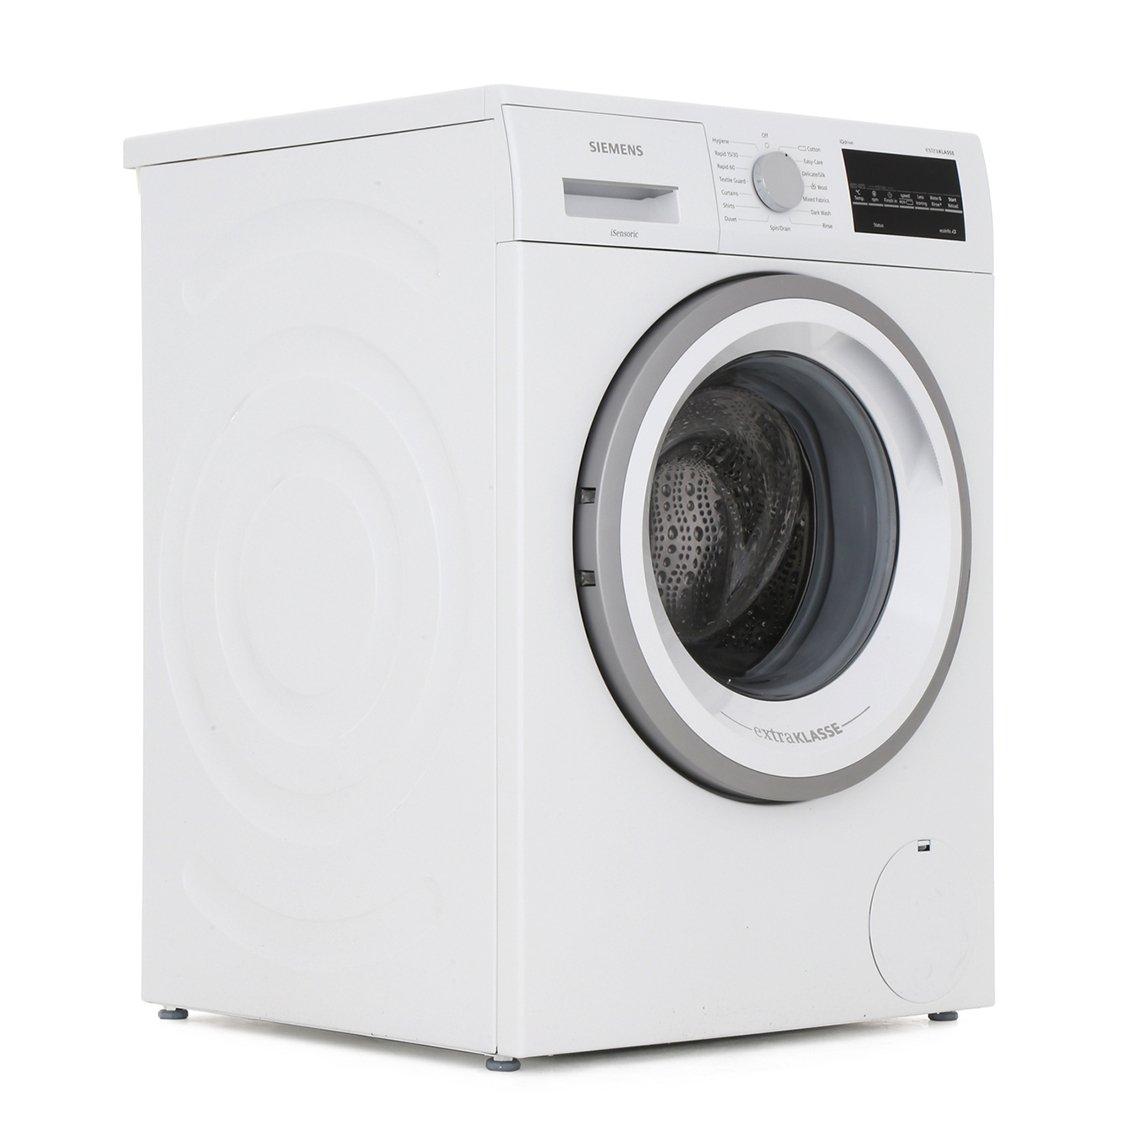 Siemens extraKlasse WM14T492GB Washing Machine